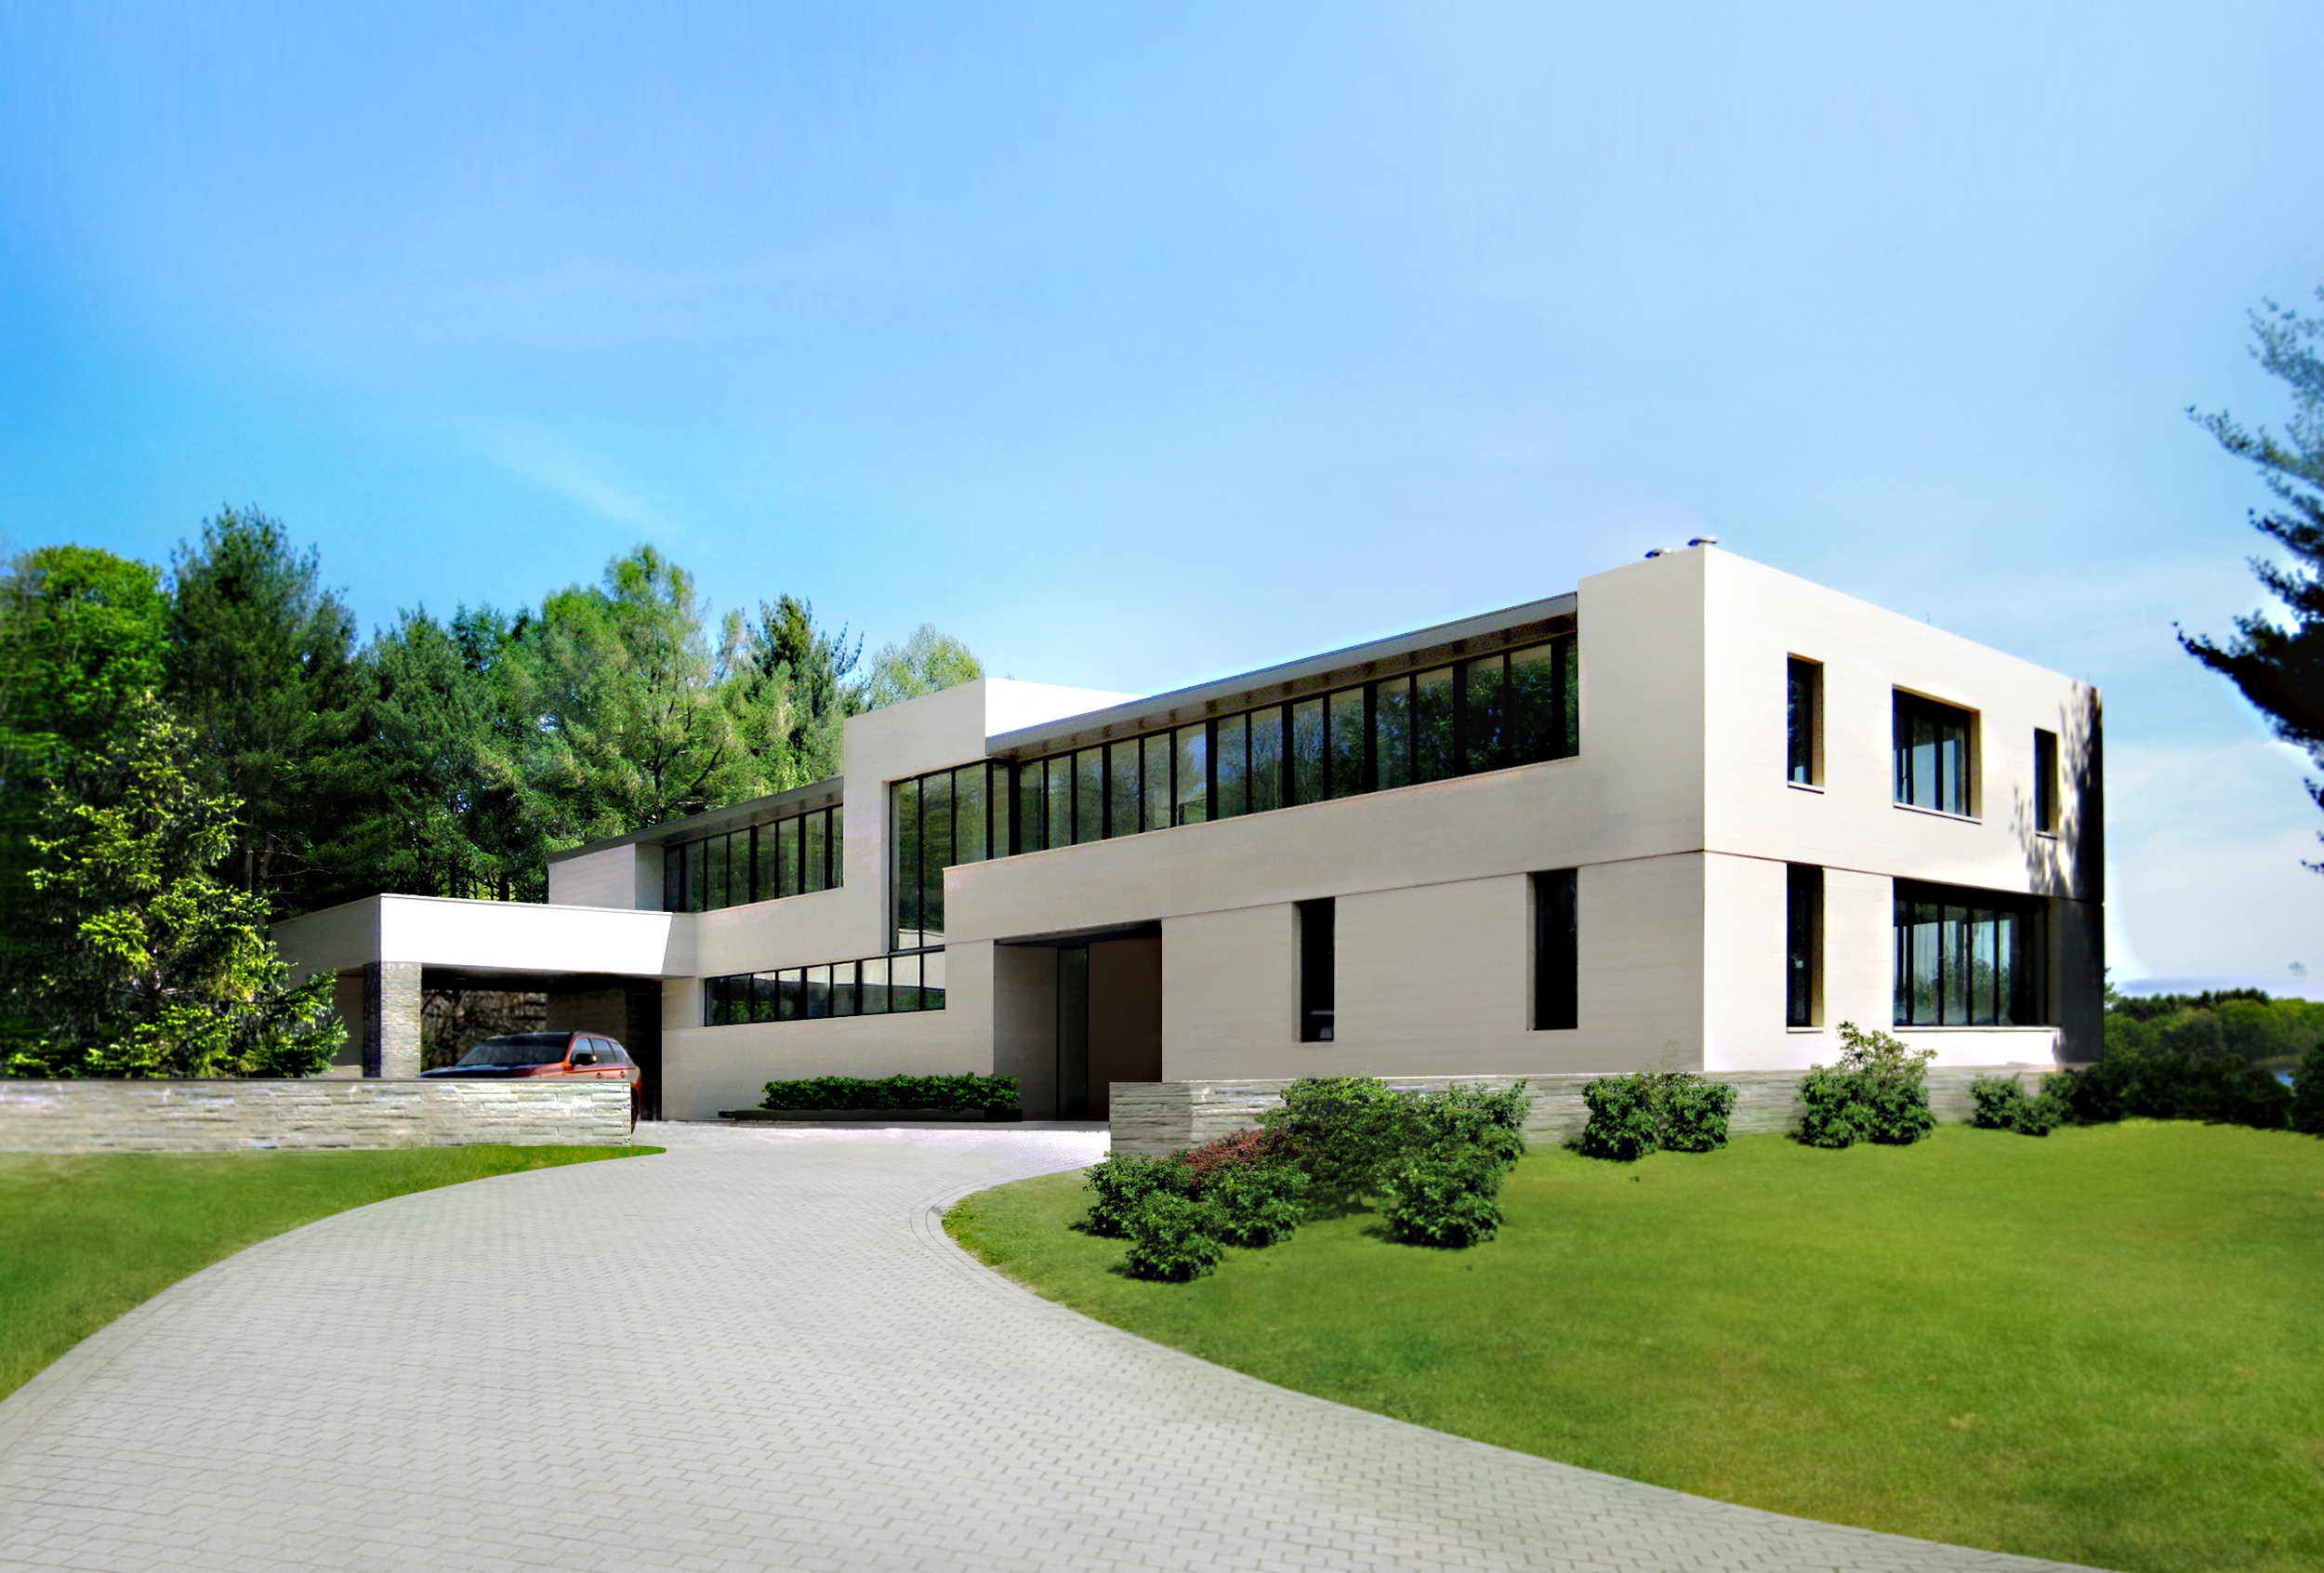 Friedman_house_01 entrance view.jpg